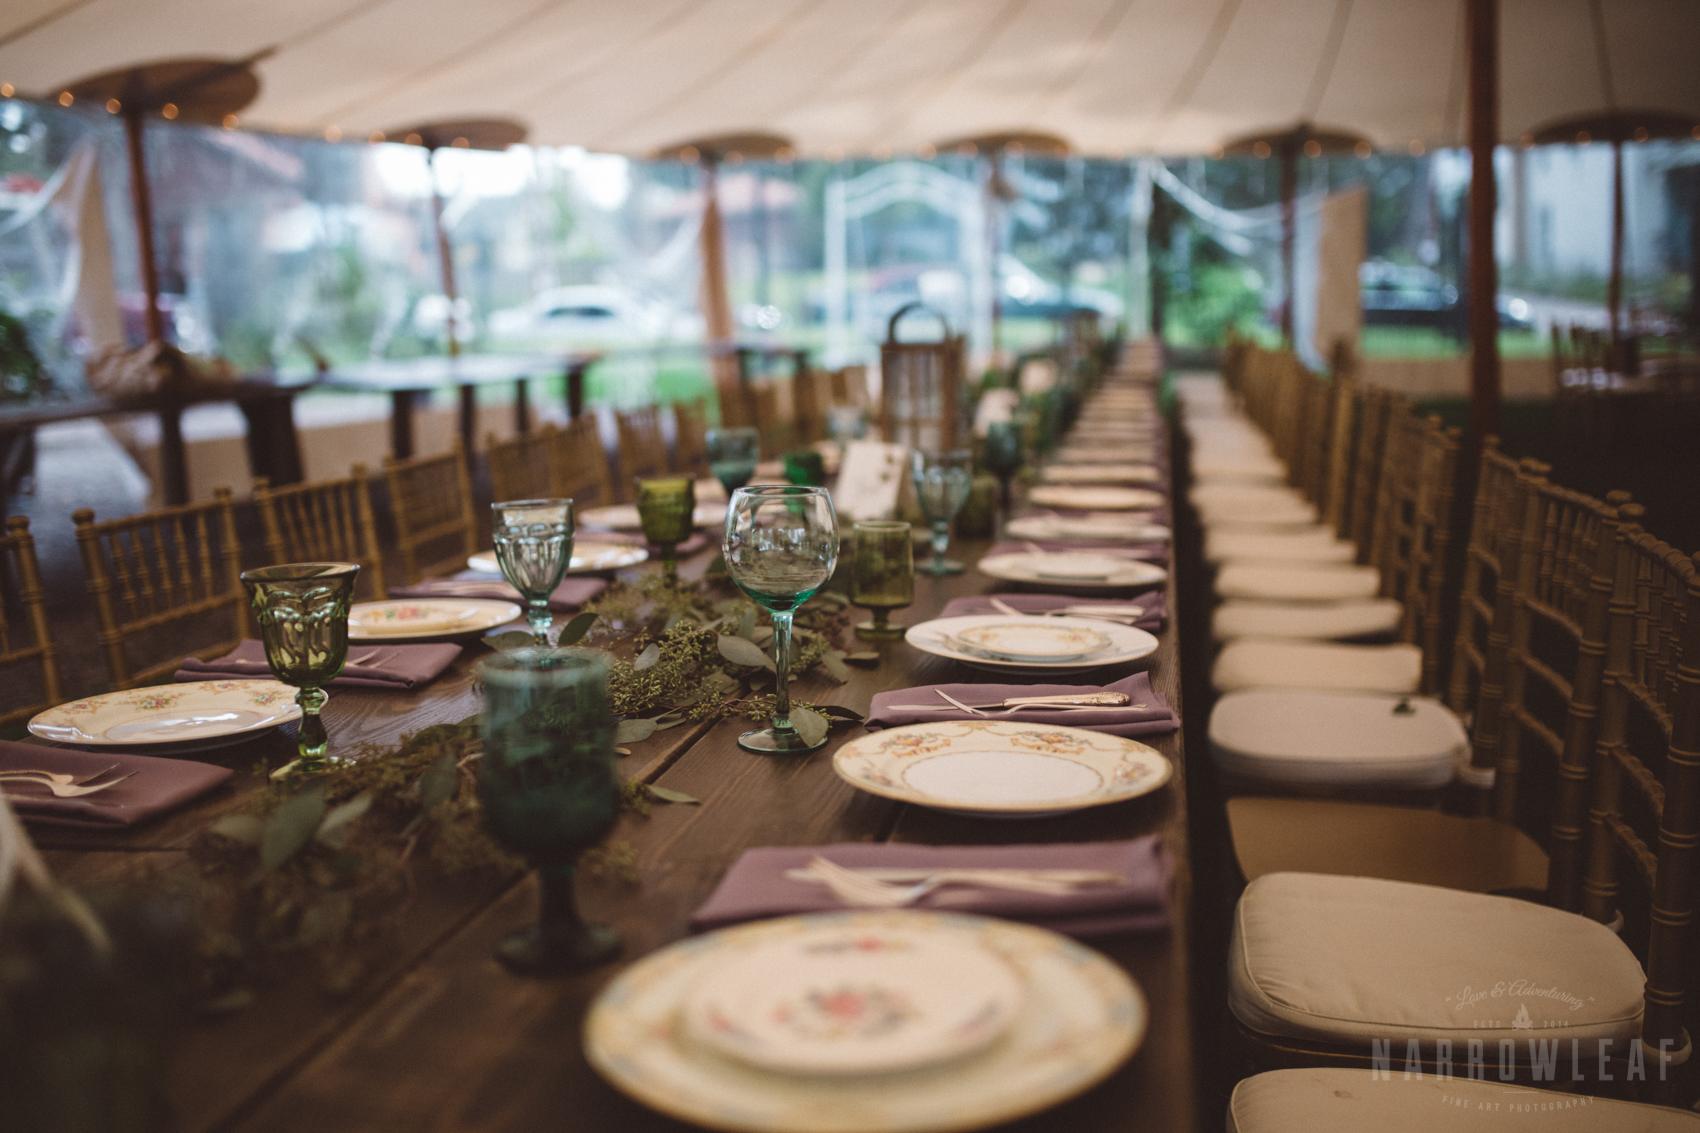 Lake-Geneva-Wisconsin-Wedding-dinner-outdoor-reception-3537.jpg